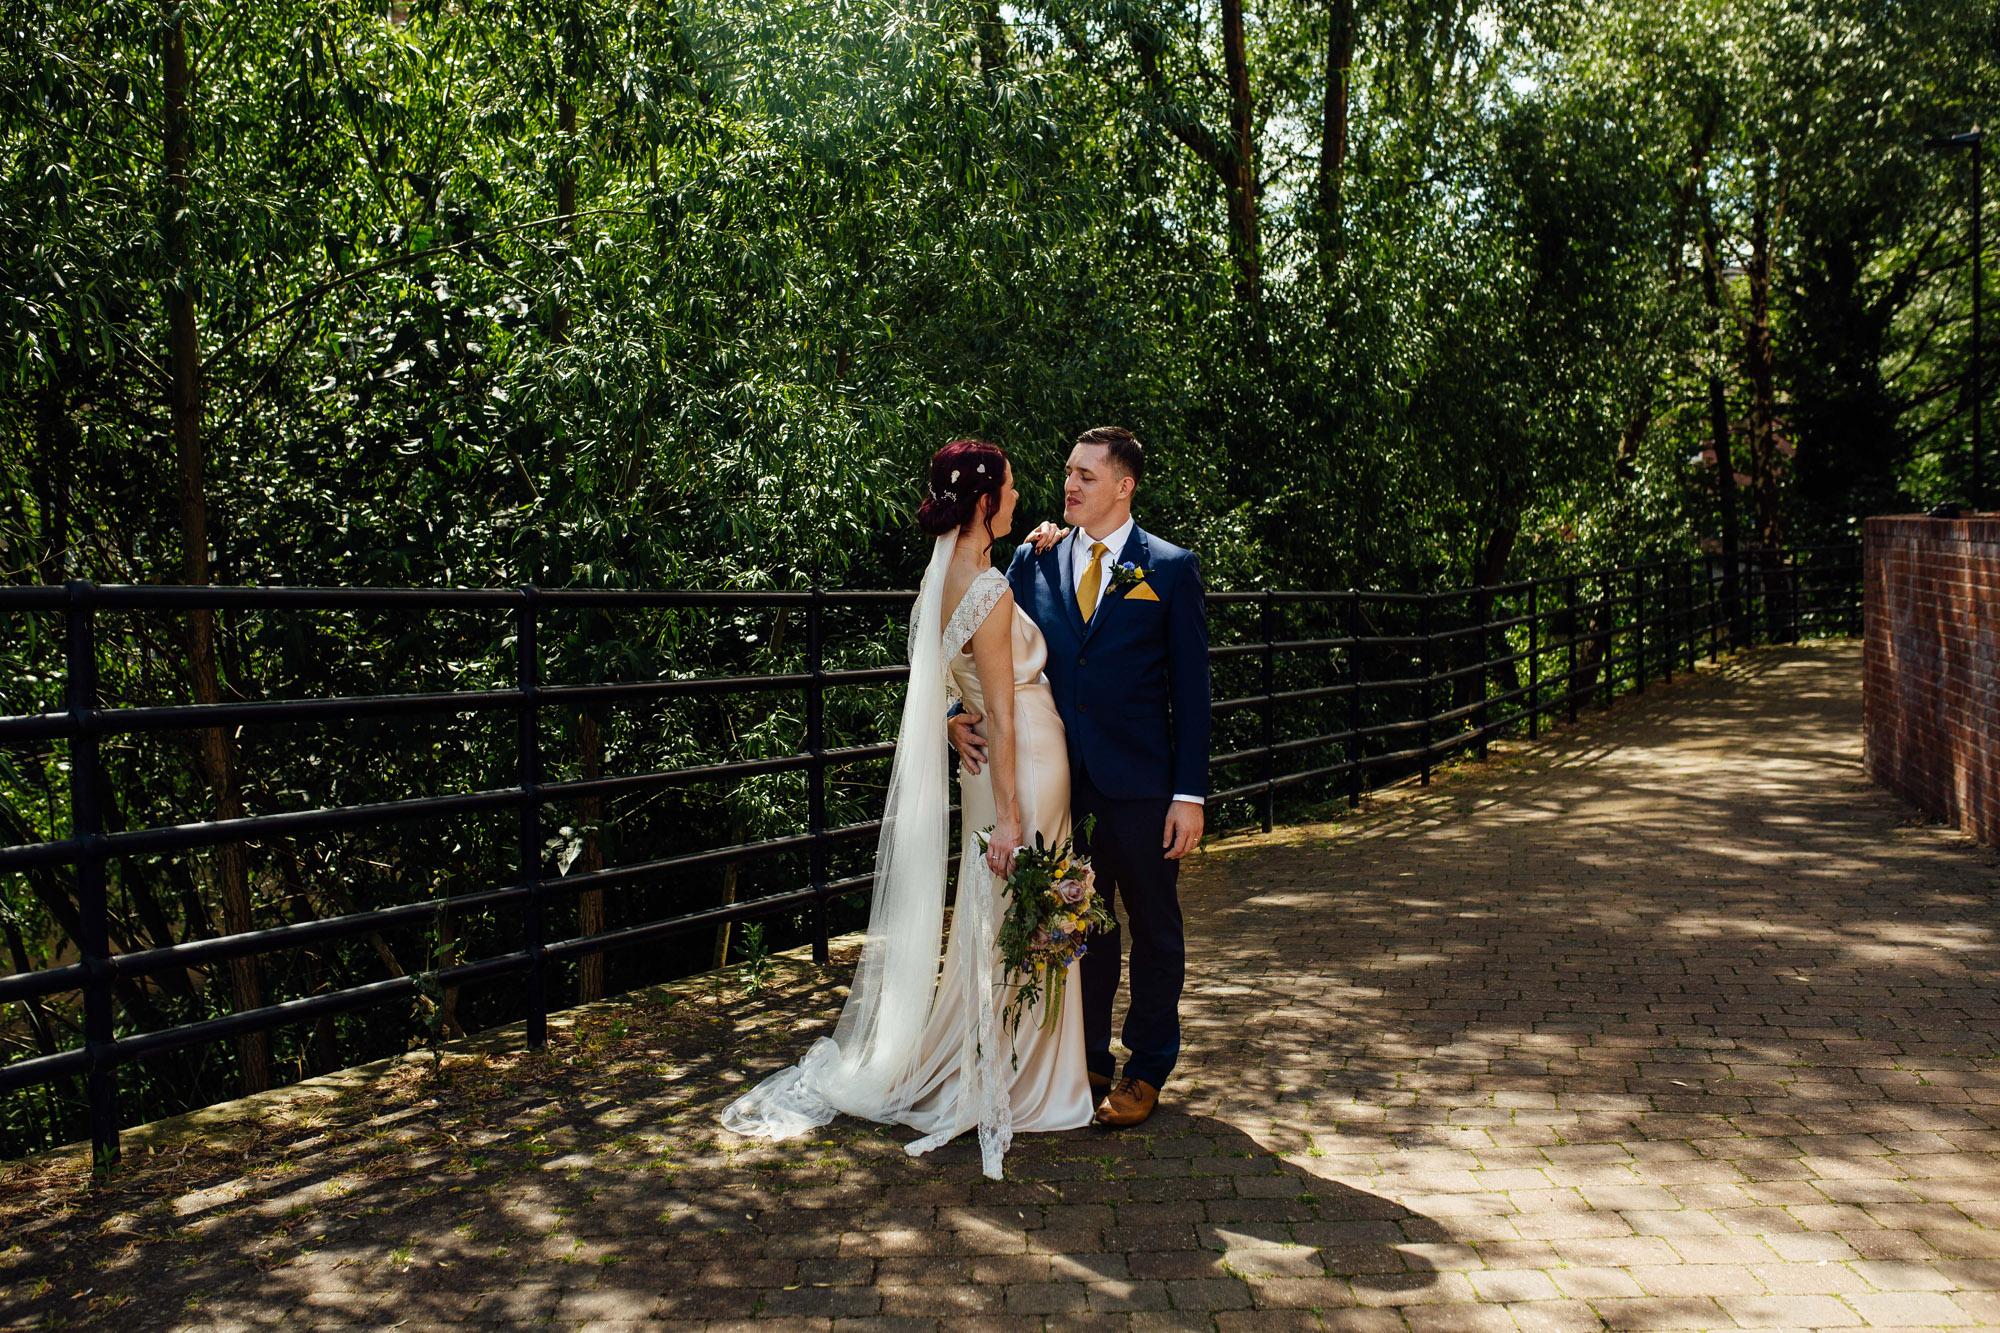 Sarah-Honeysuckle-Bias-Cut-Silk-Vintage-Inspired-Wedding-Gown-Sheffield-Wedding-Kate-Beaumont-34.jpg